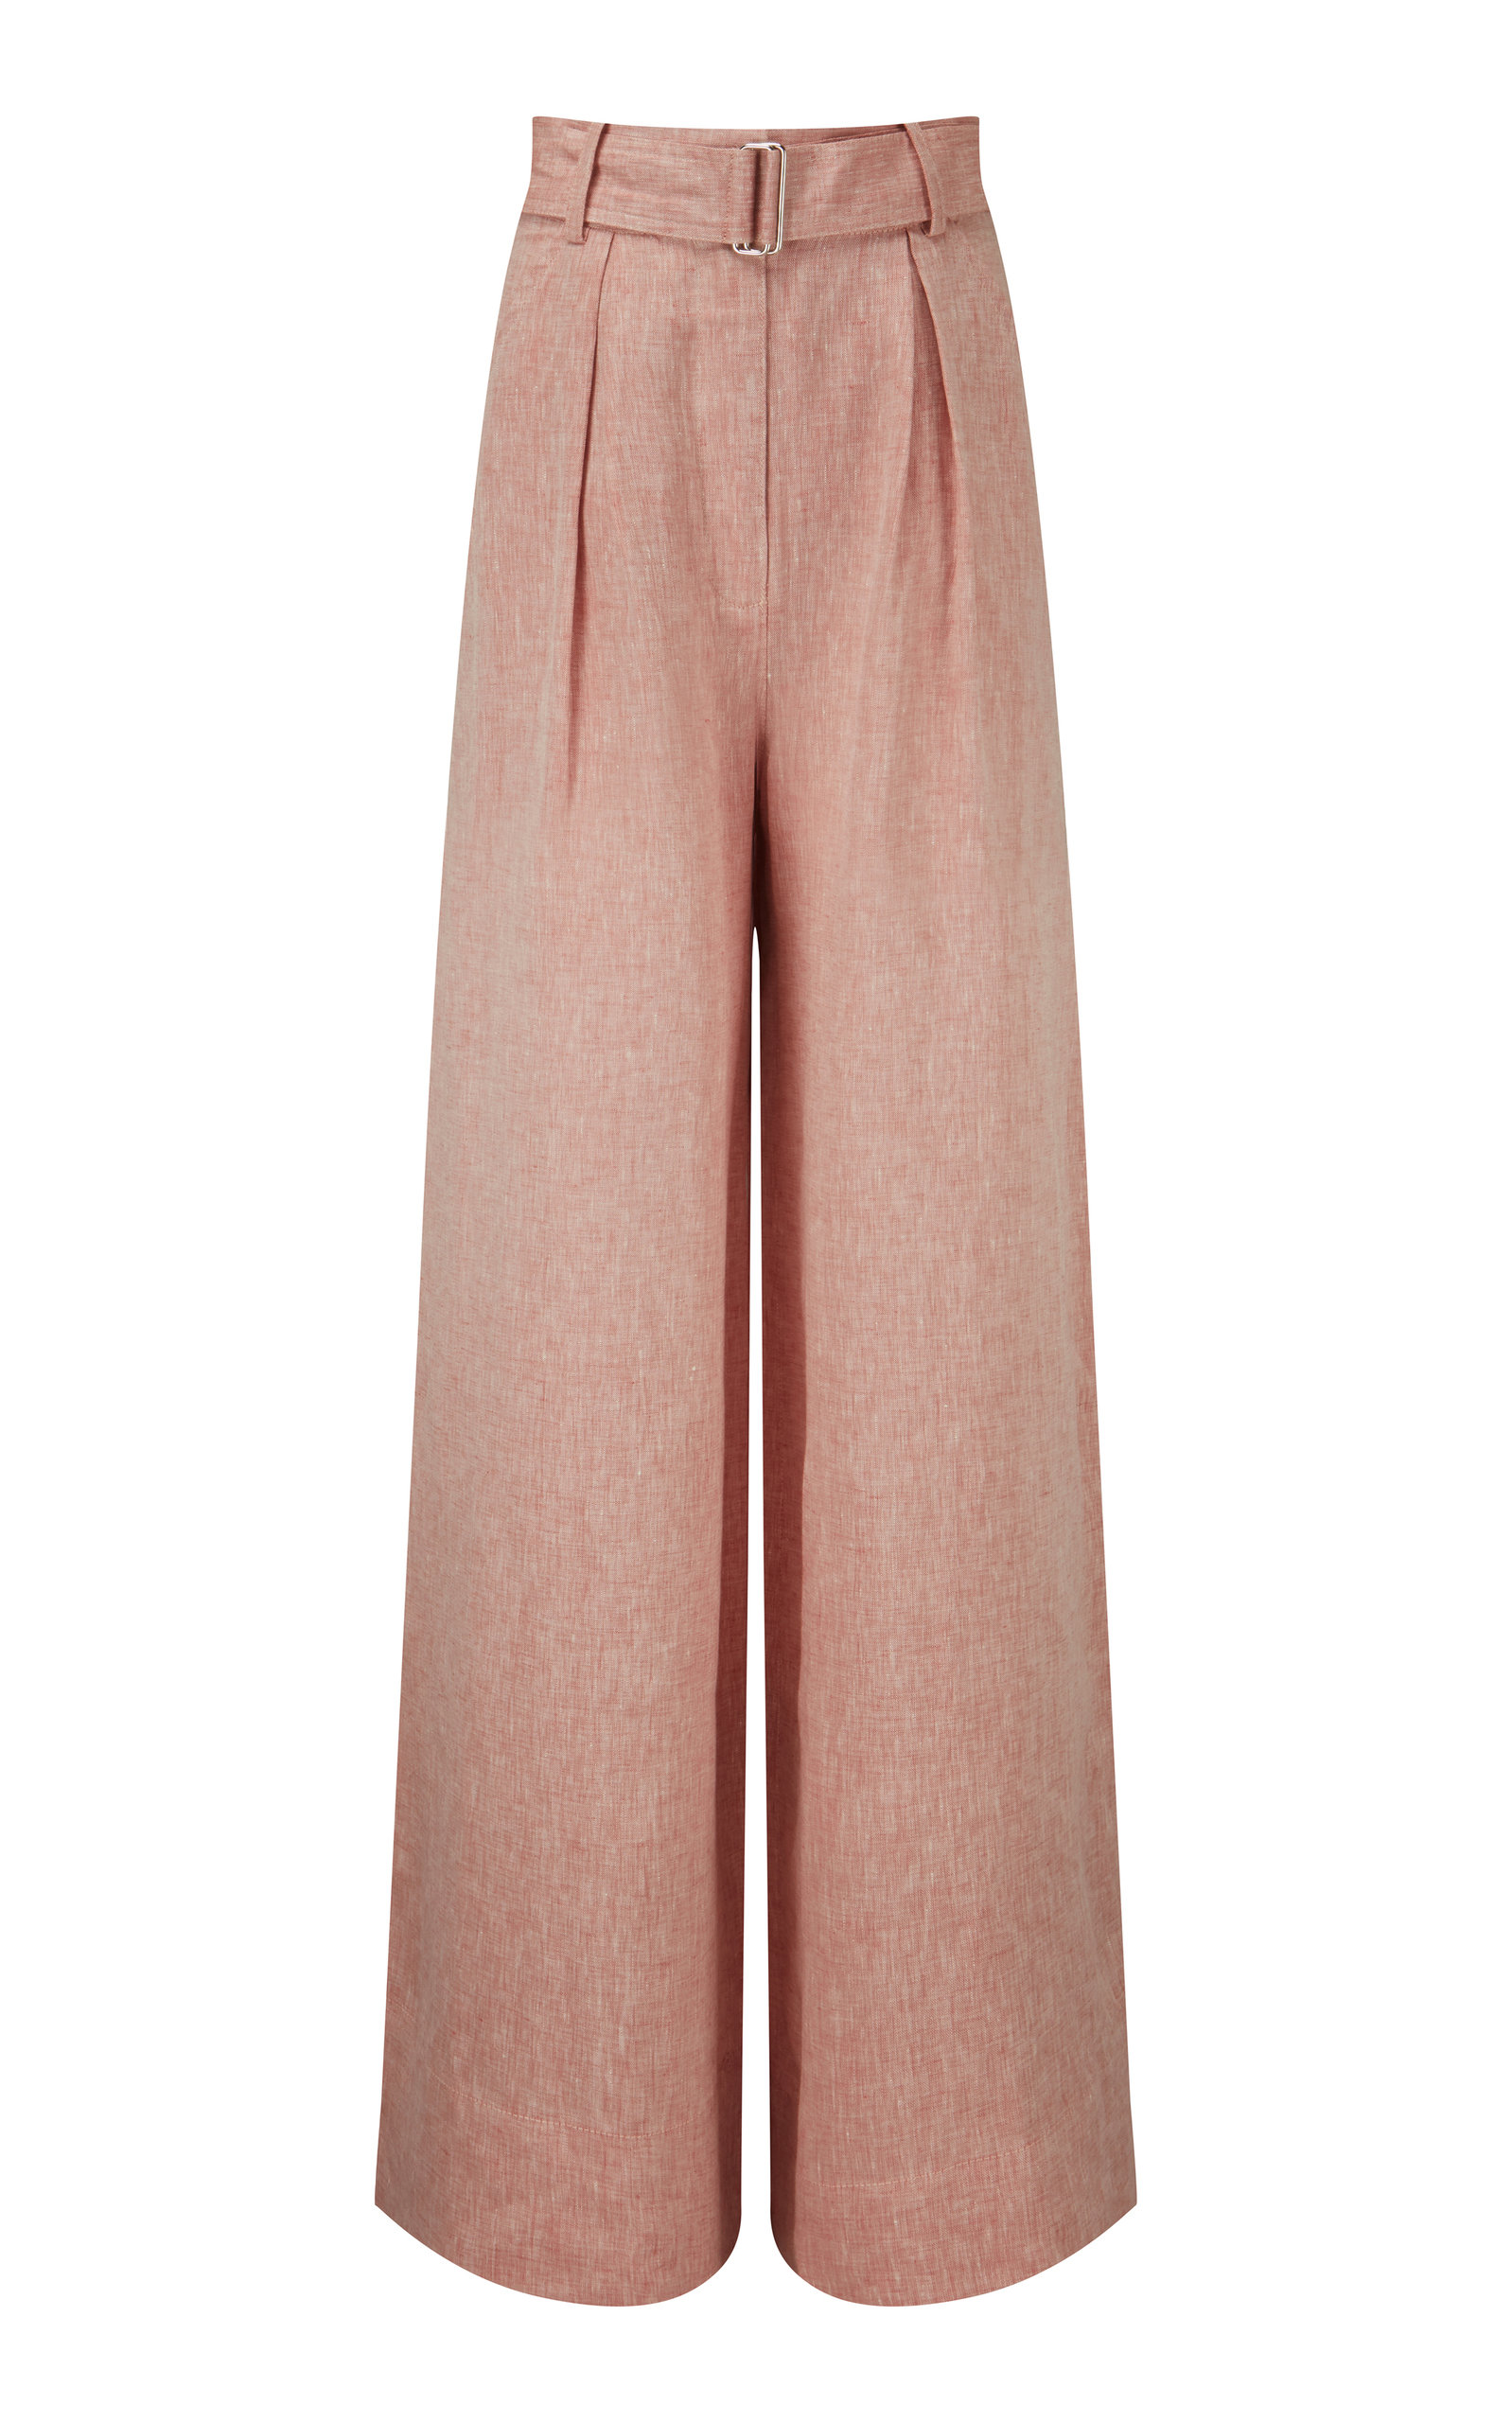 Women's Pleated High-Rise Linen Wide-Leg Pants